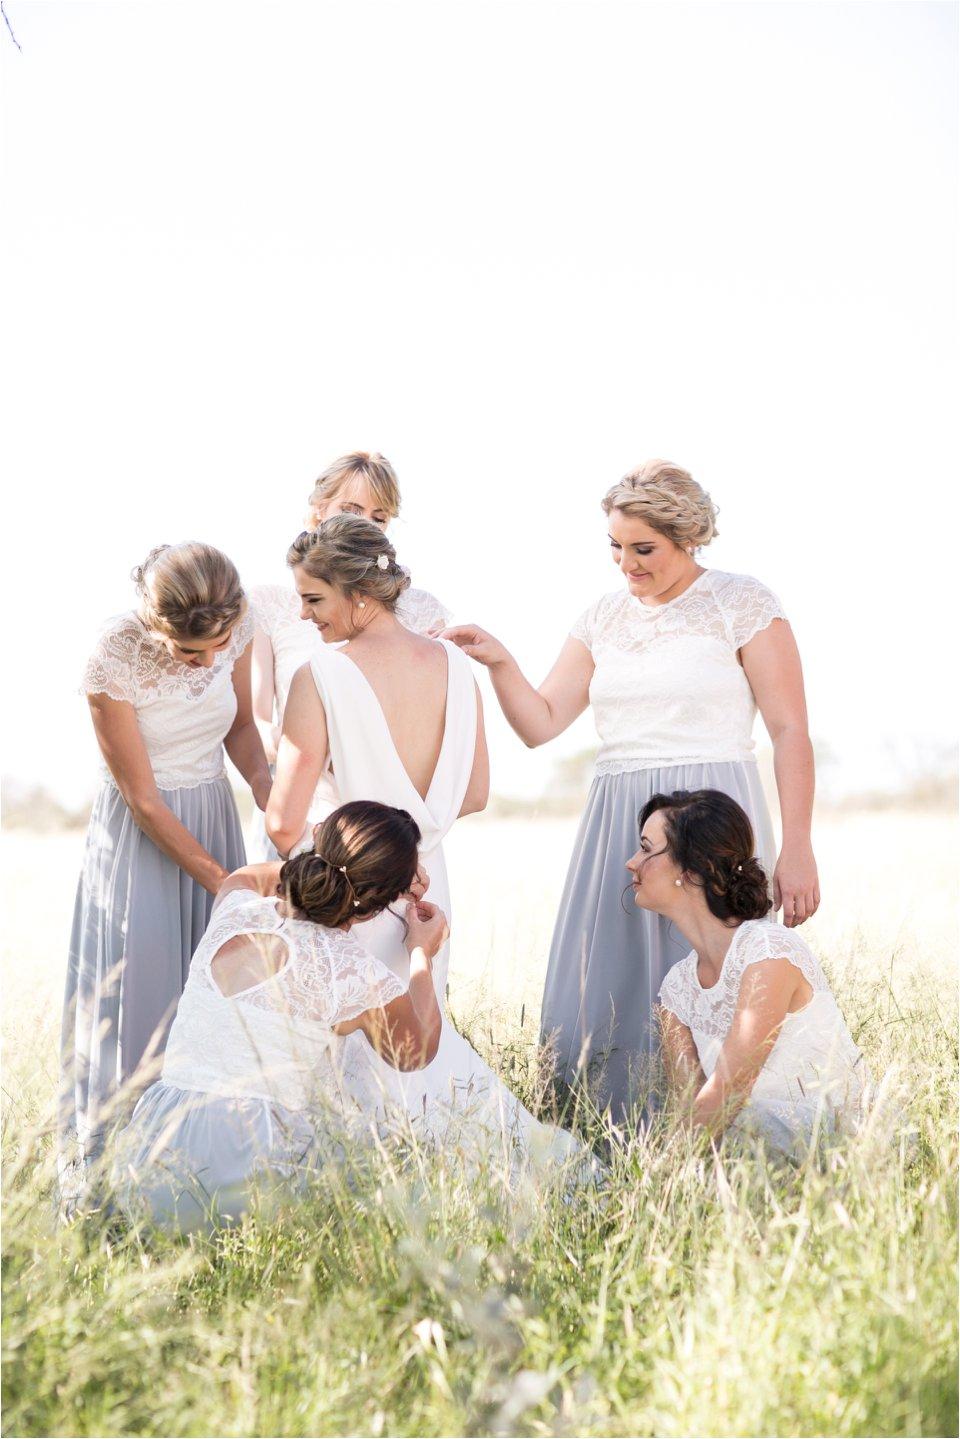 Uurpan-Sweizer-Reyneke-wedding_0018